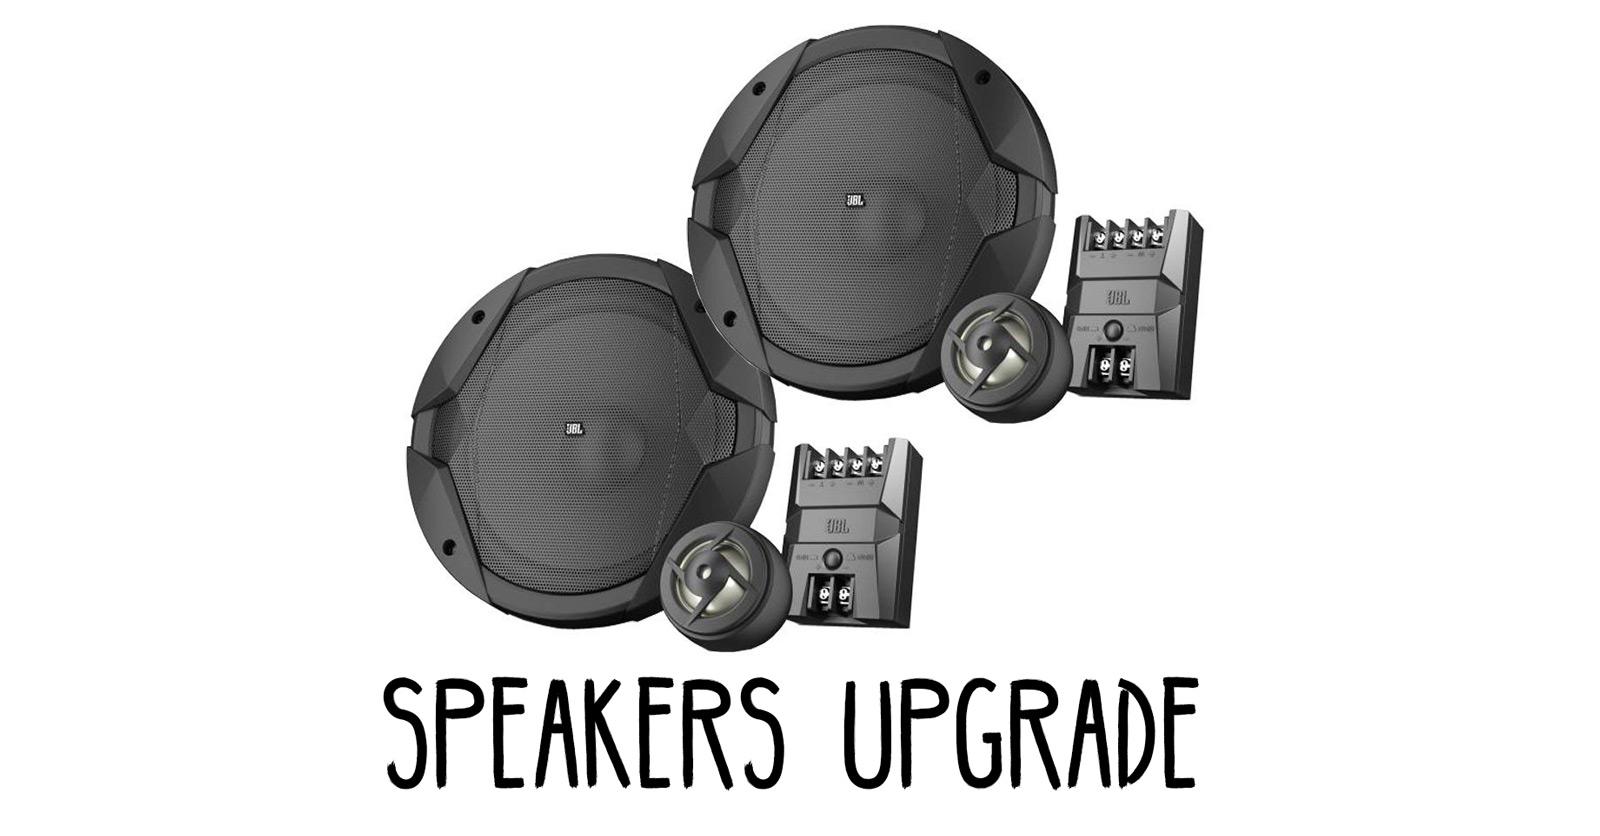 Speakers-Upgrade-Heading--Website-1000px